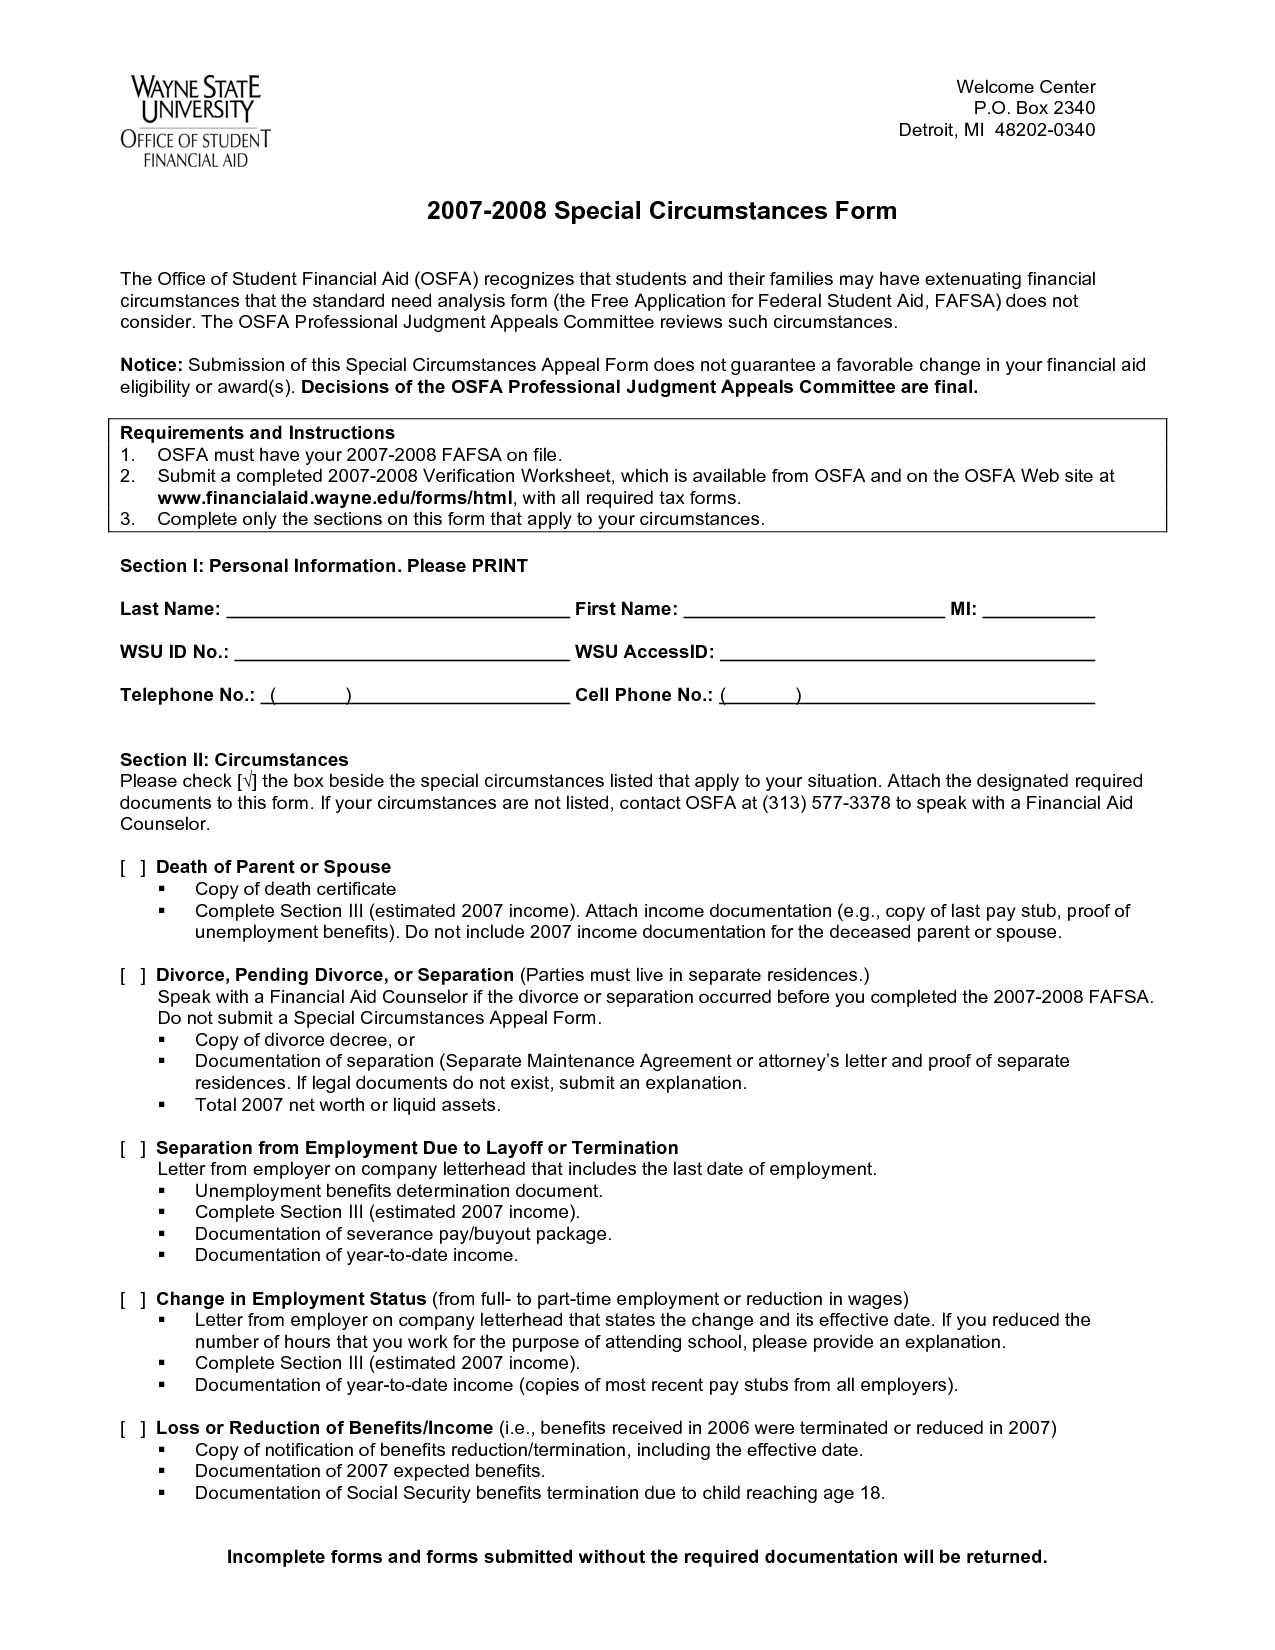 Printable Divorce Papers In Va | Download Them Or Print - Free Printable Divorce Papers